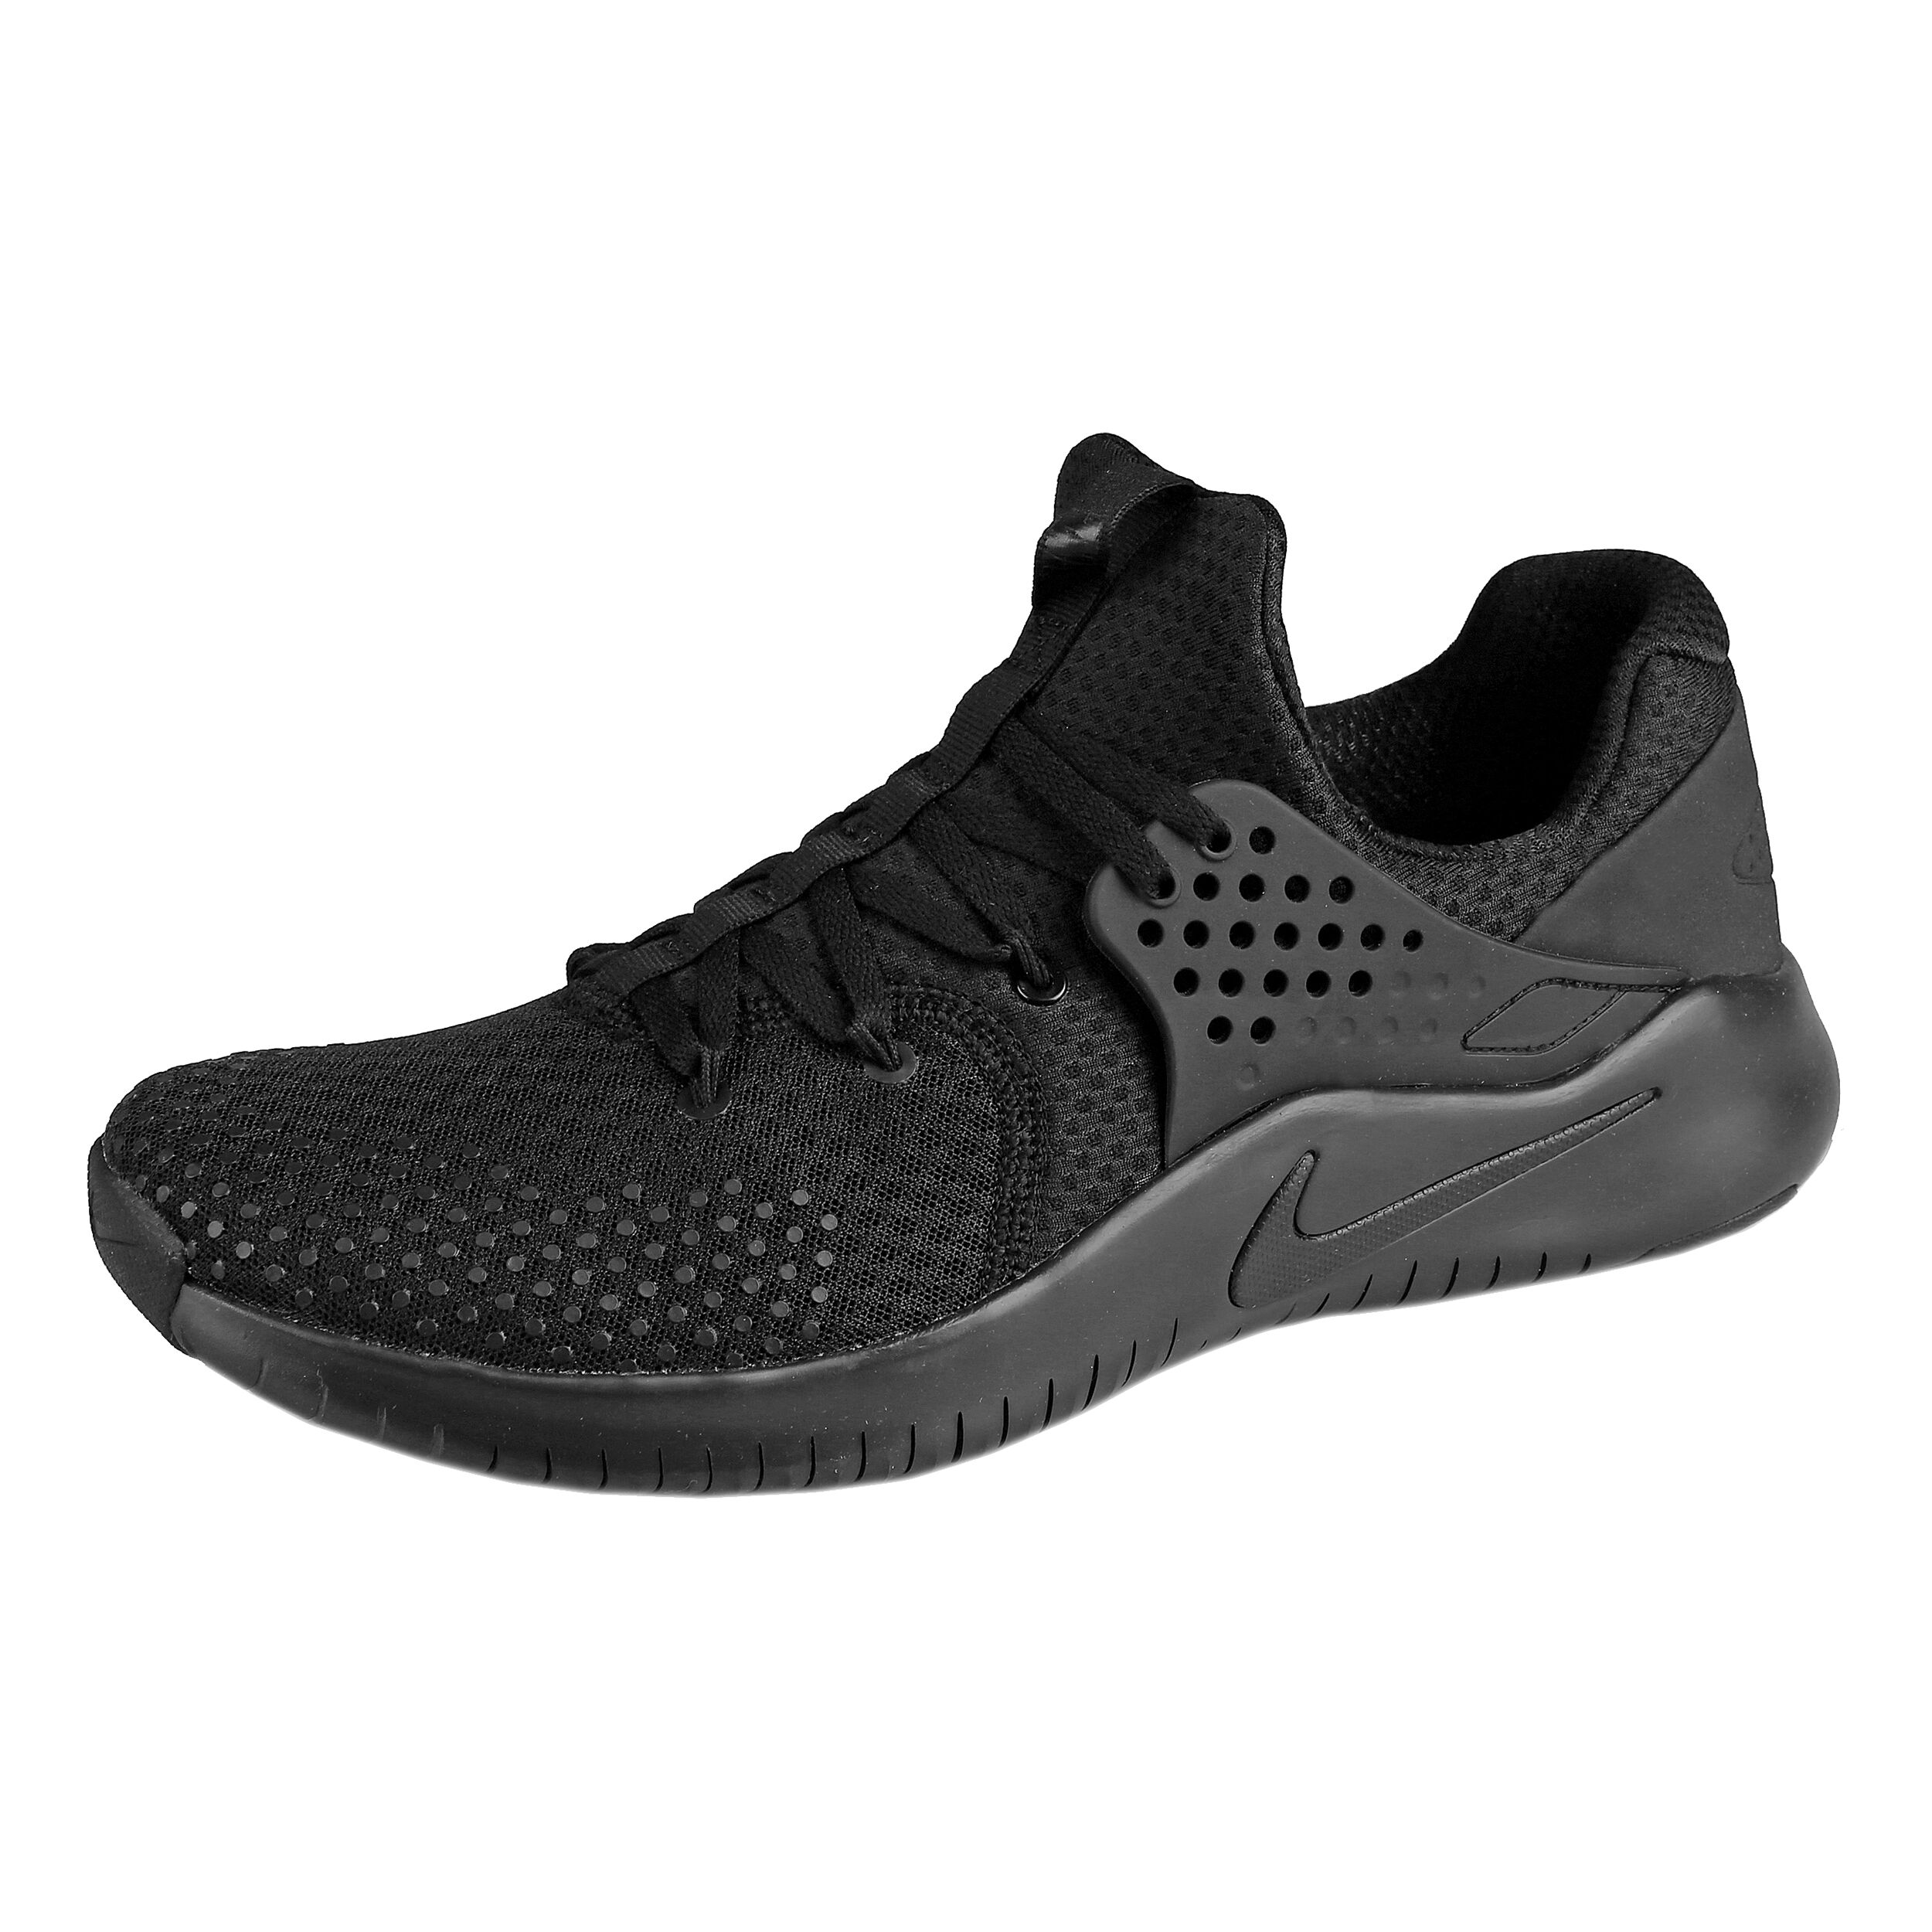 Herren SchwarzDunkelgrau Free Fitnessschuh Nike V8 Trainer WEHeID92bY